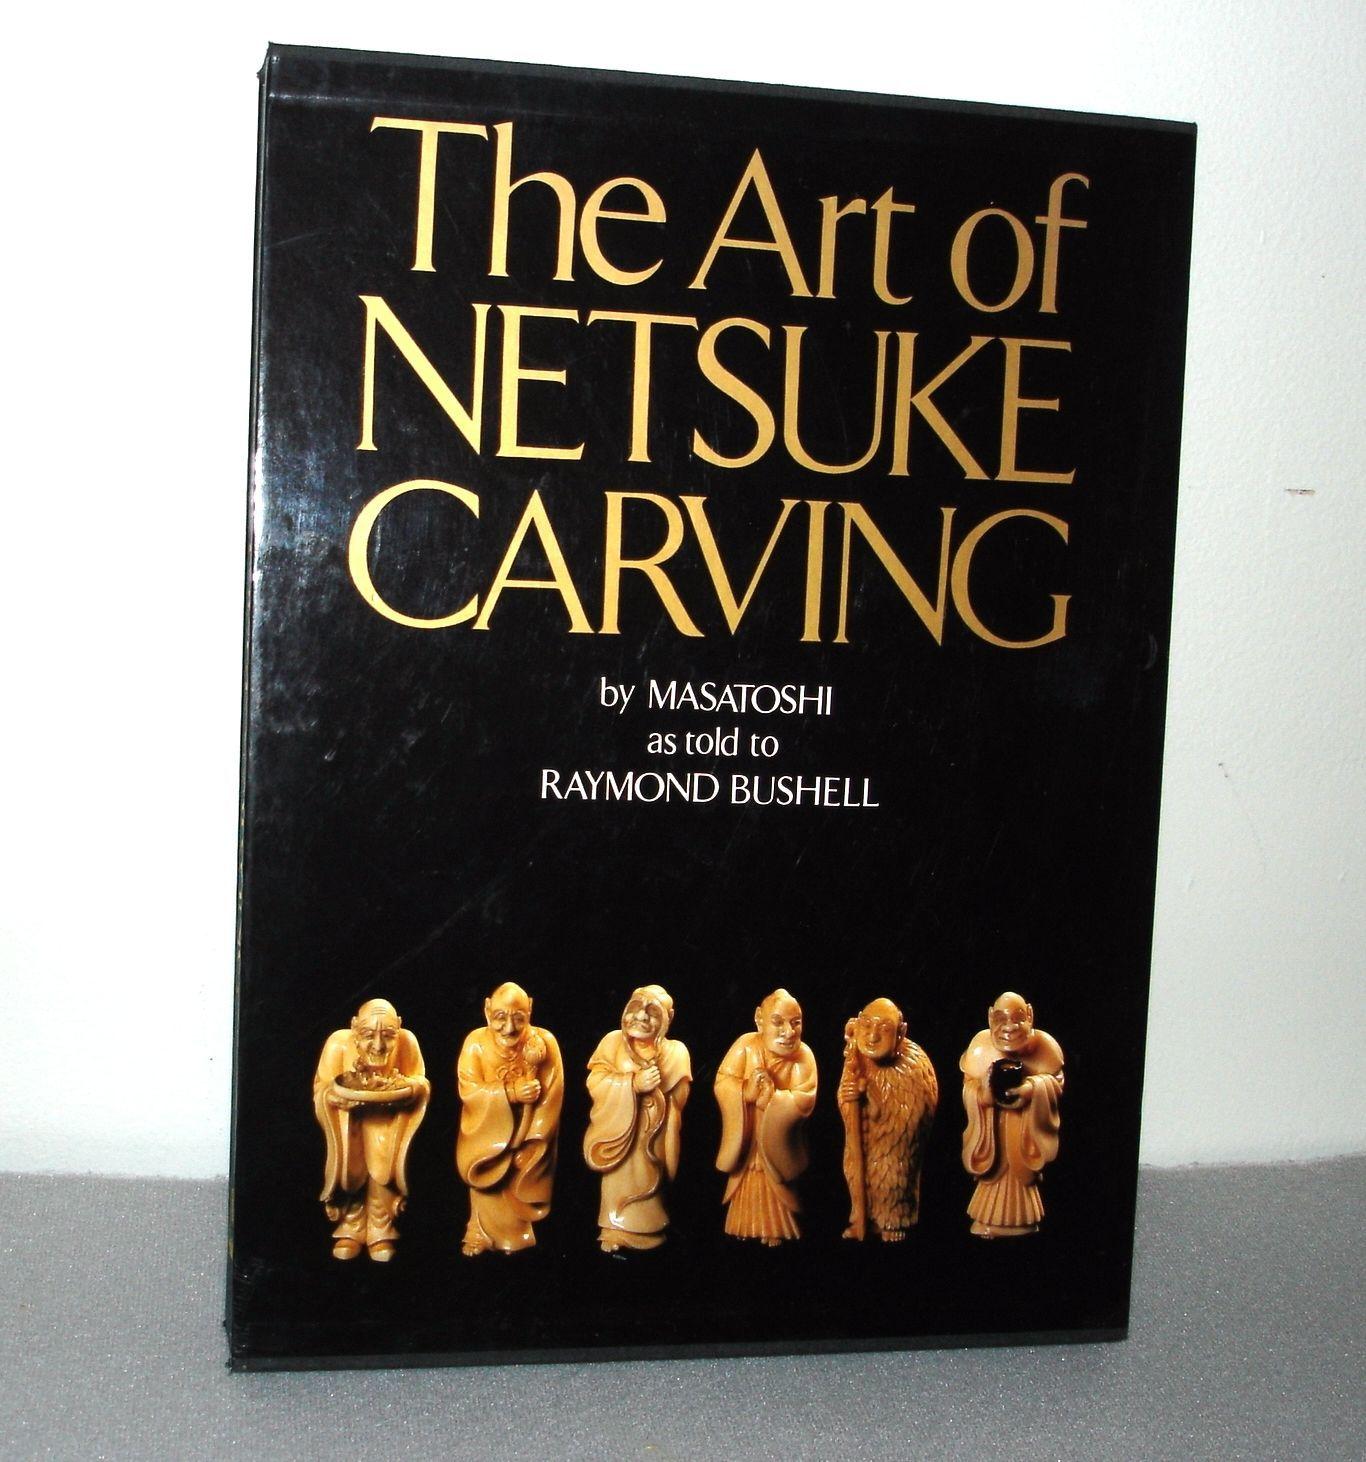 The Art of Netsuke Carving by Masatoshi (1992, Hardcover, Reprint)